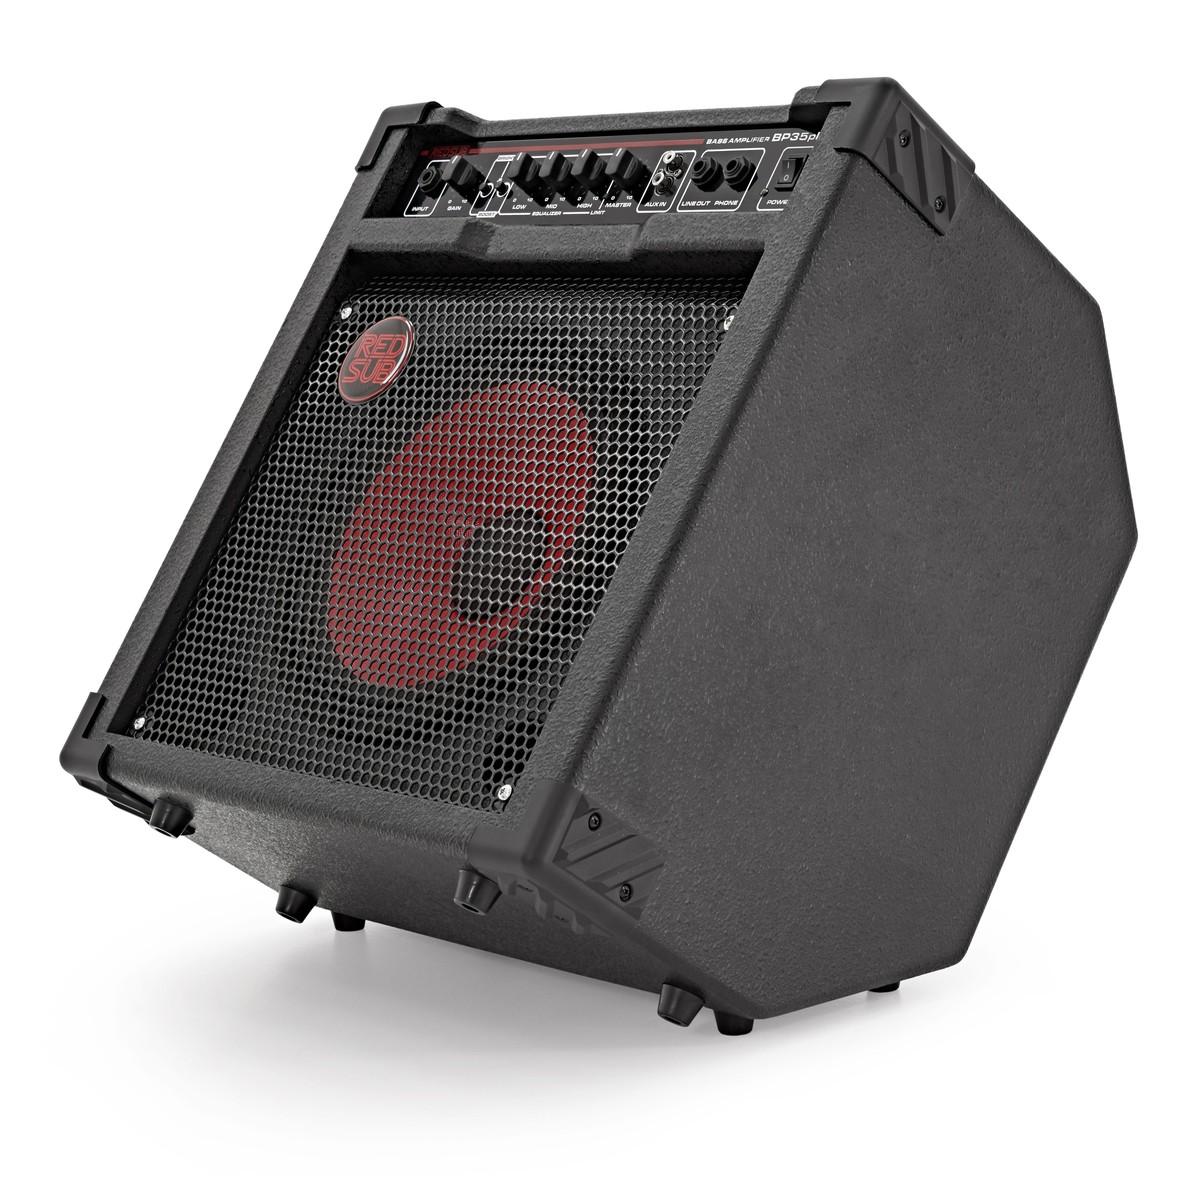 redsub bp35plus 35w bass guitar amplifier at. Black Bedroom Furniture Sets. Home Design Ideas